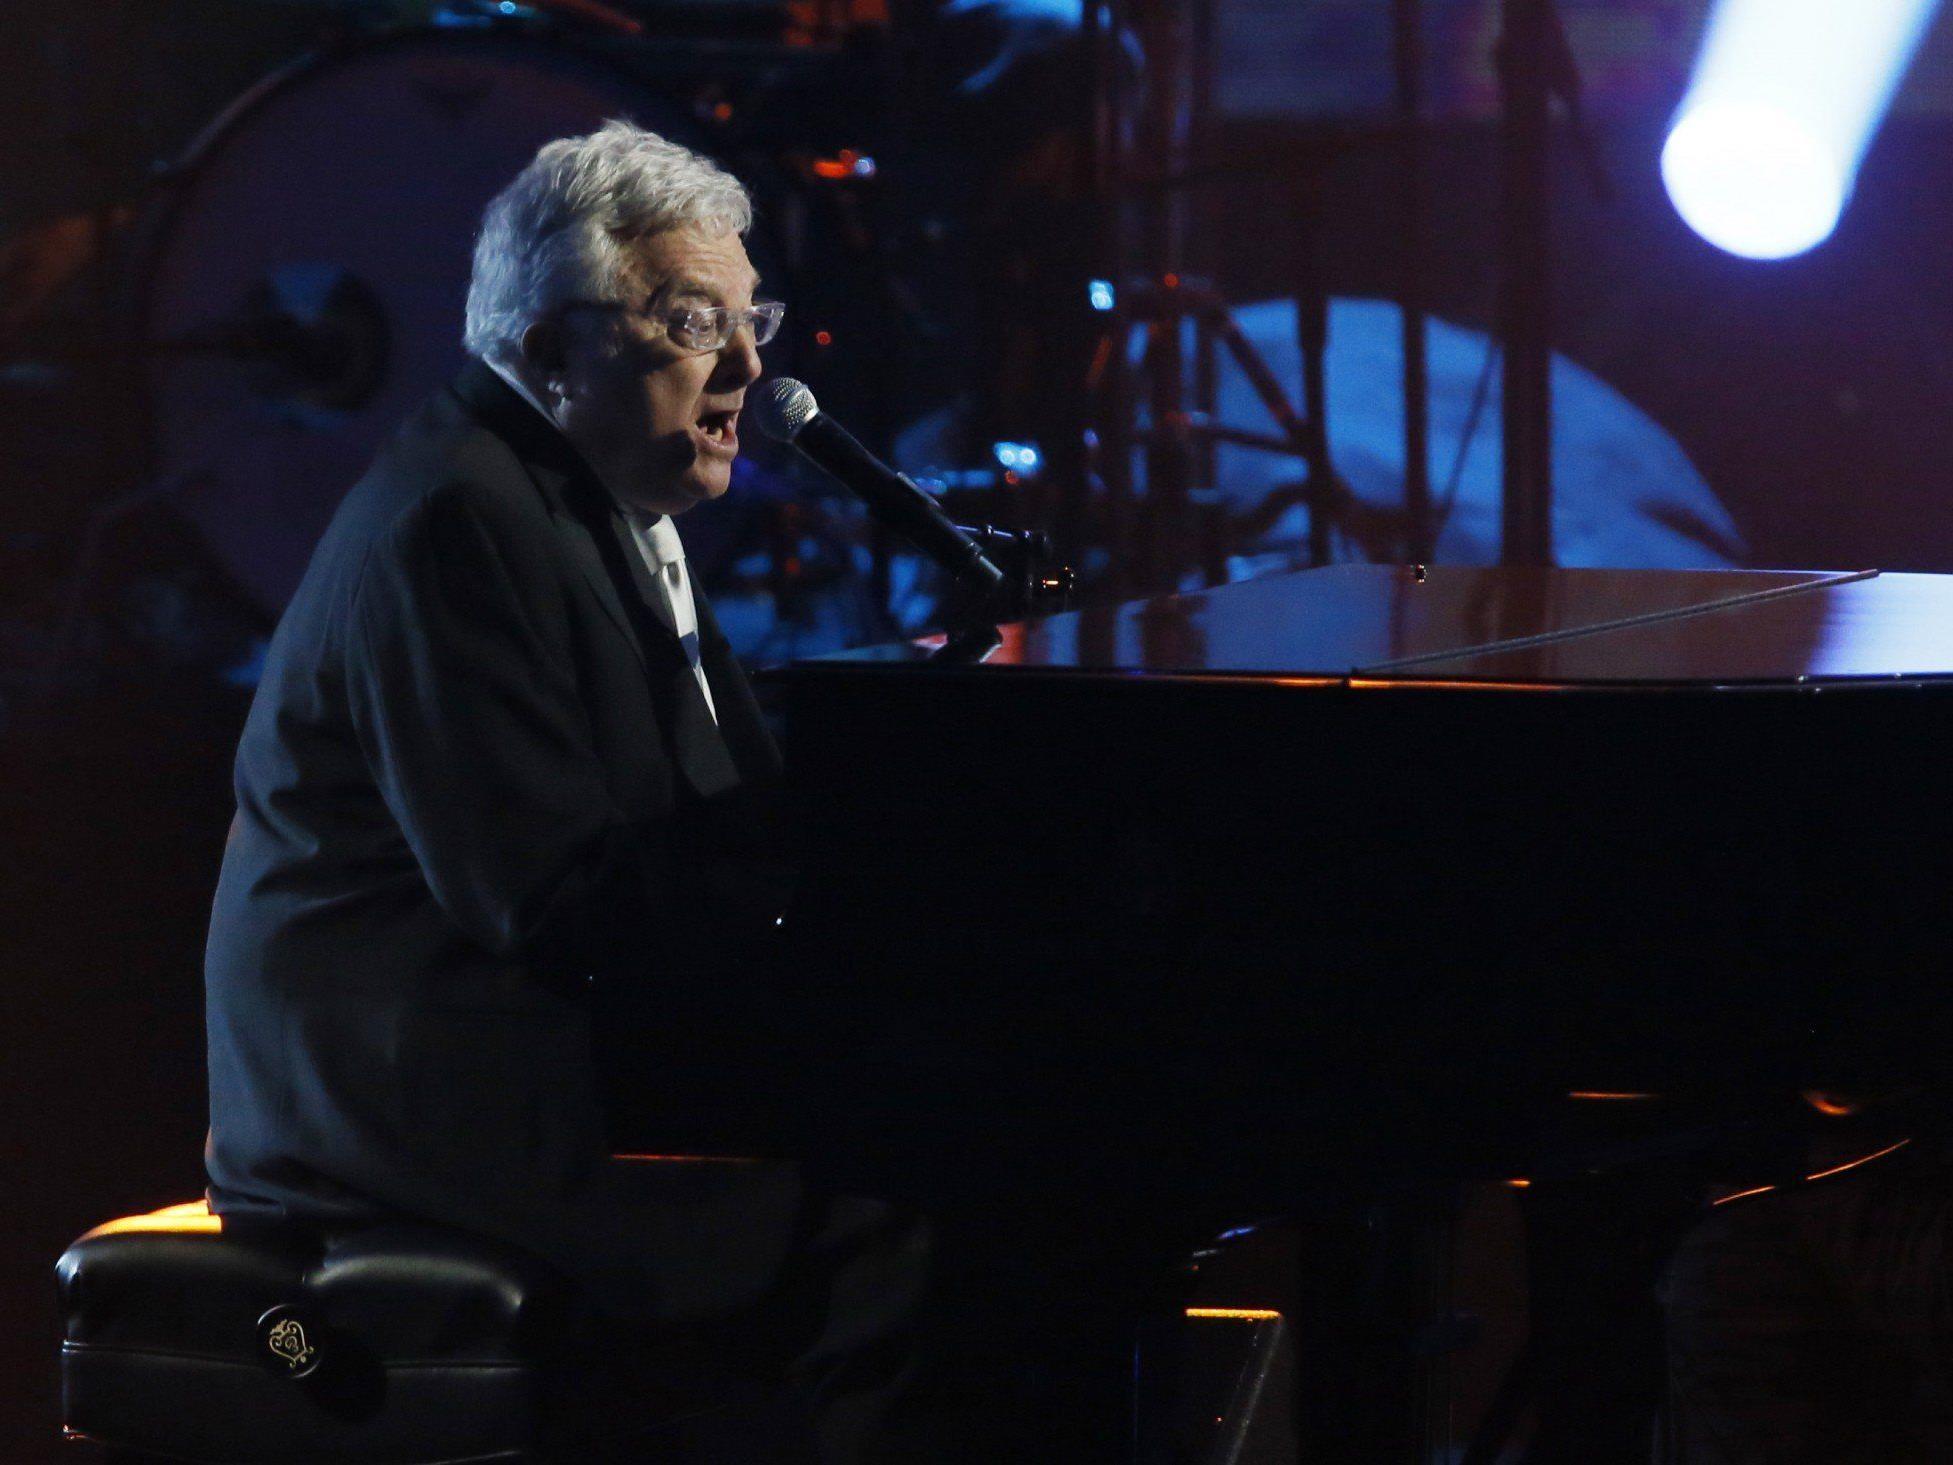 Randy Newman erhält heuer den Max-Steiner-Preis